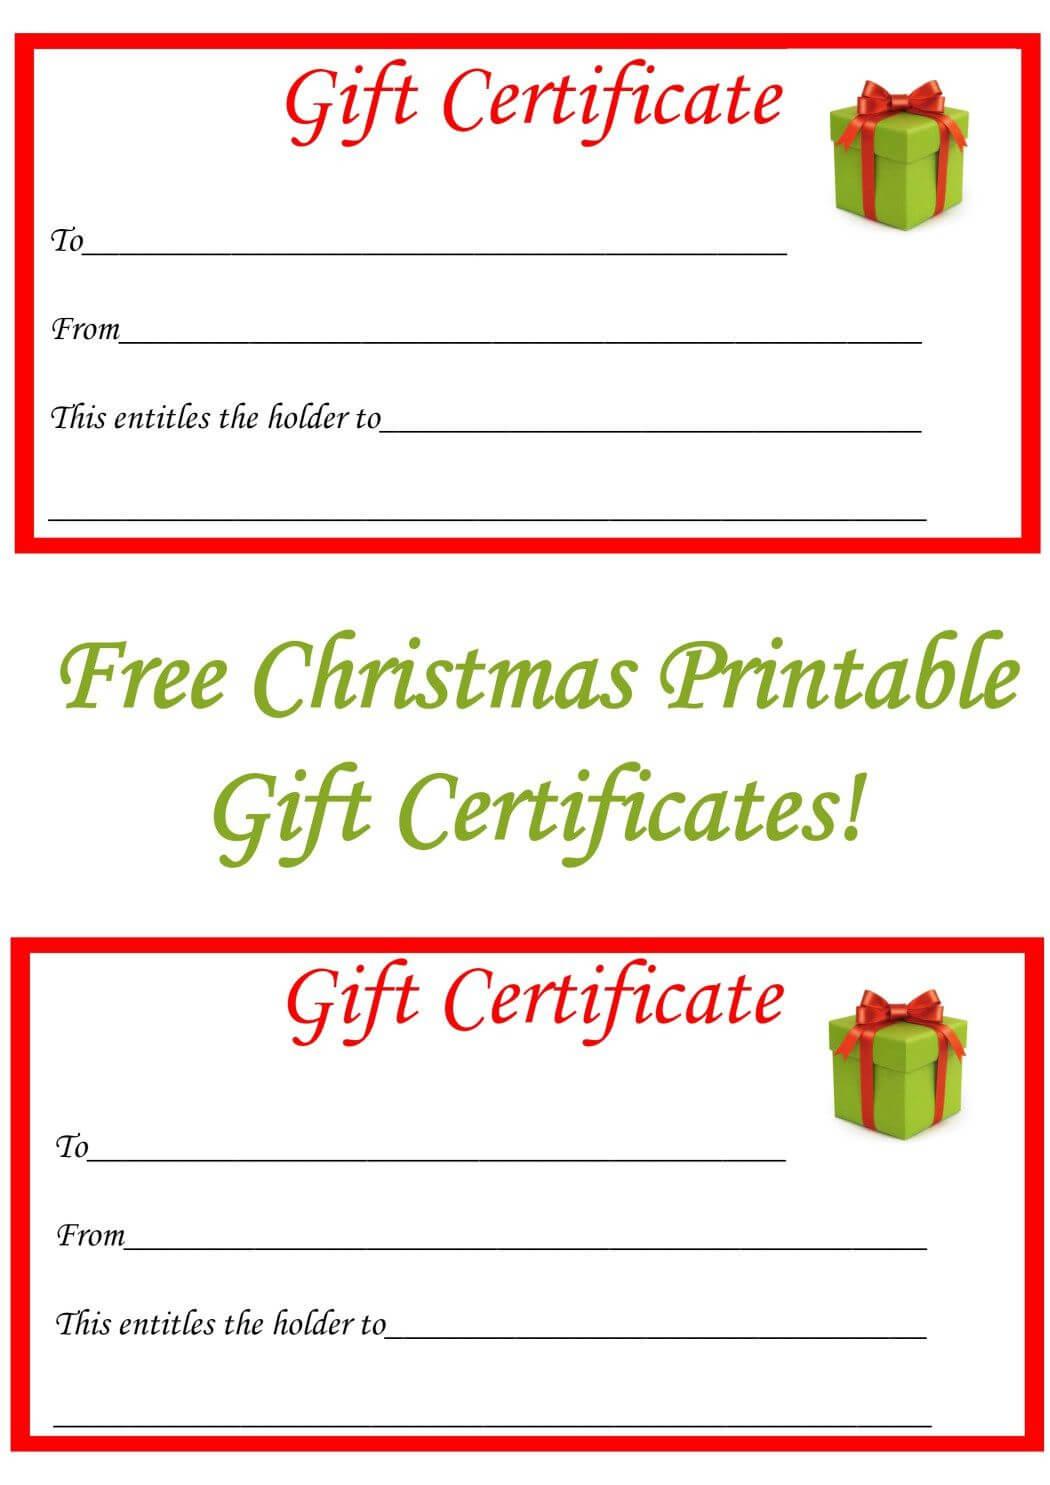 Free Christmas Printable Gift Certificates | Gift Ideas Regarding Free Christmas Gift Certificate Templates